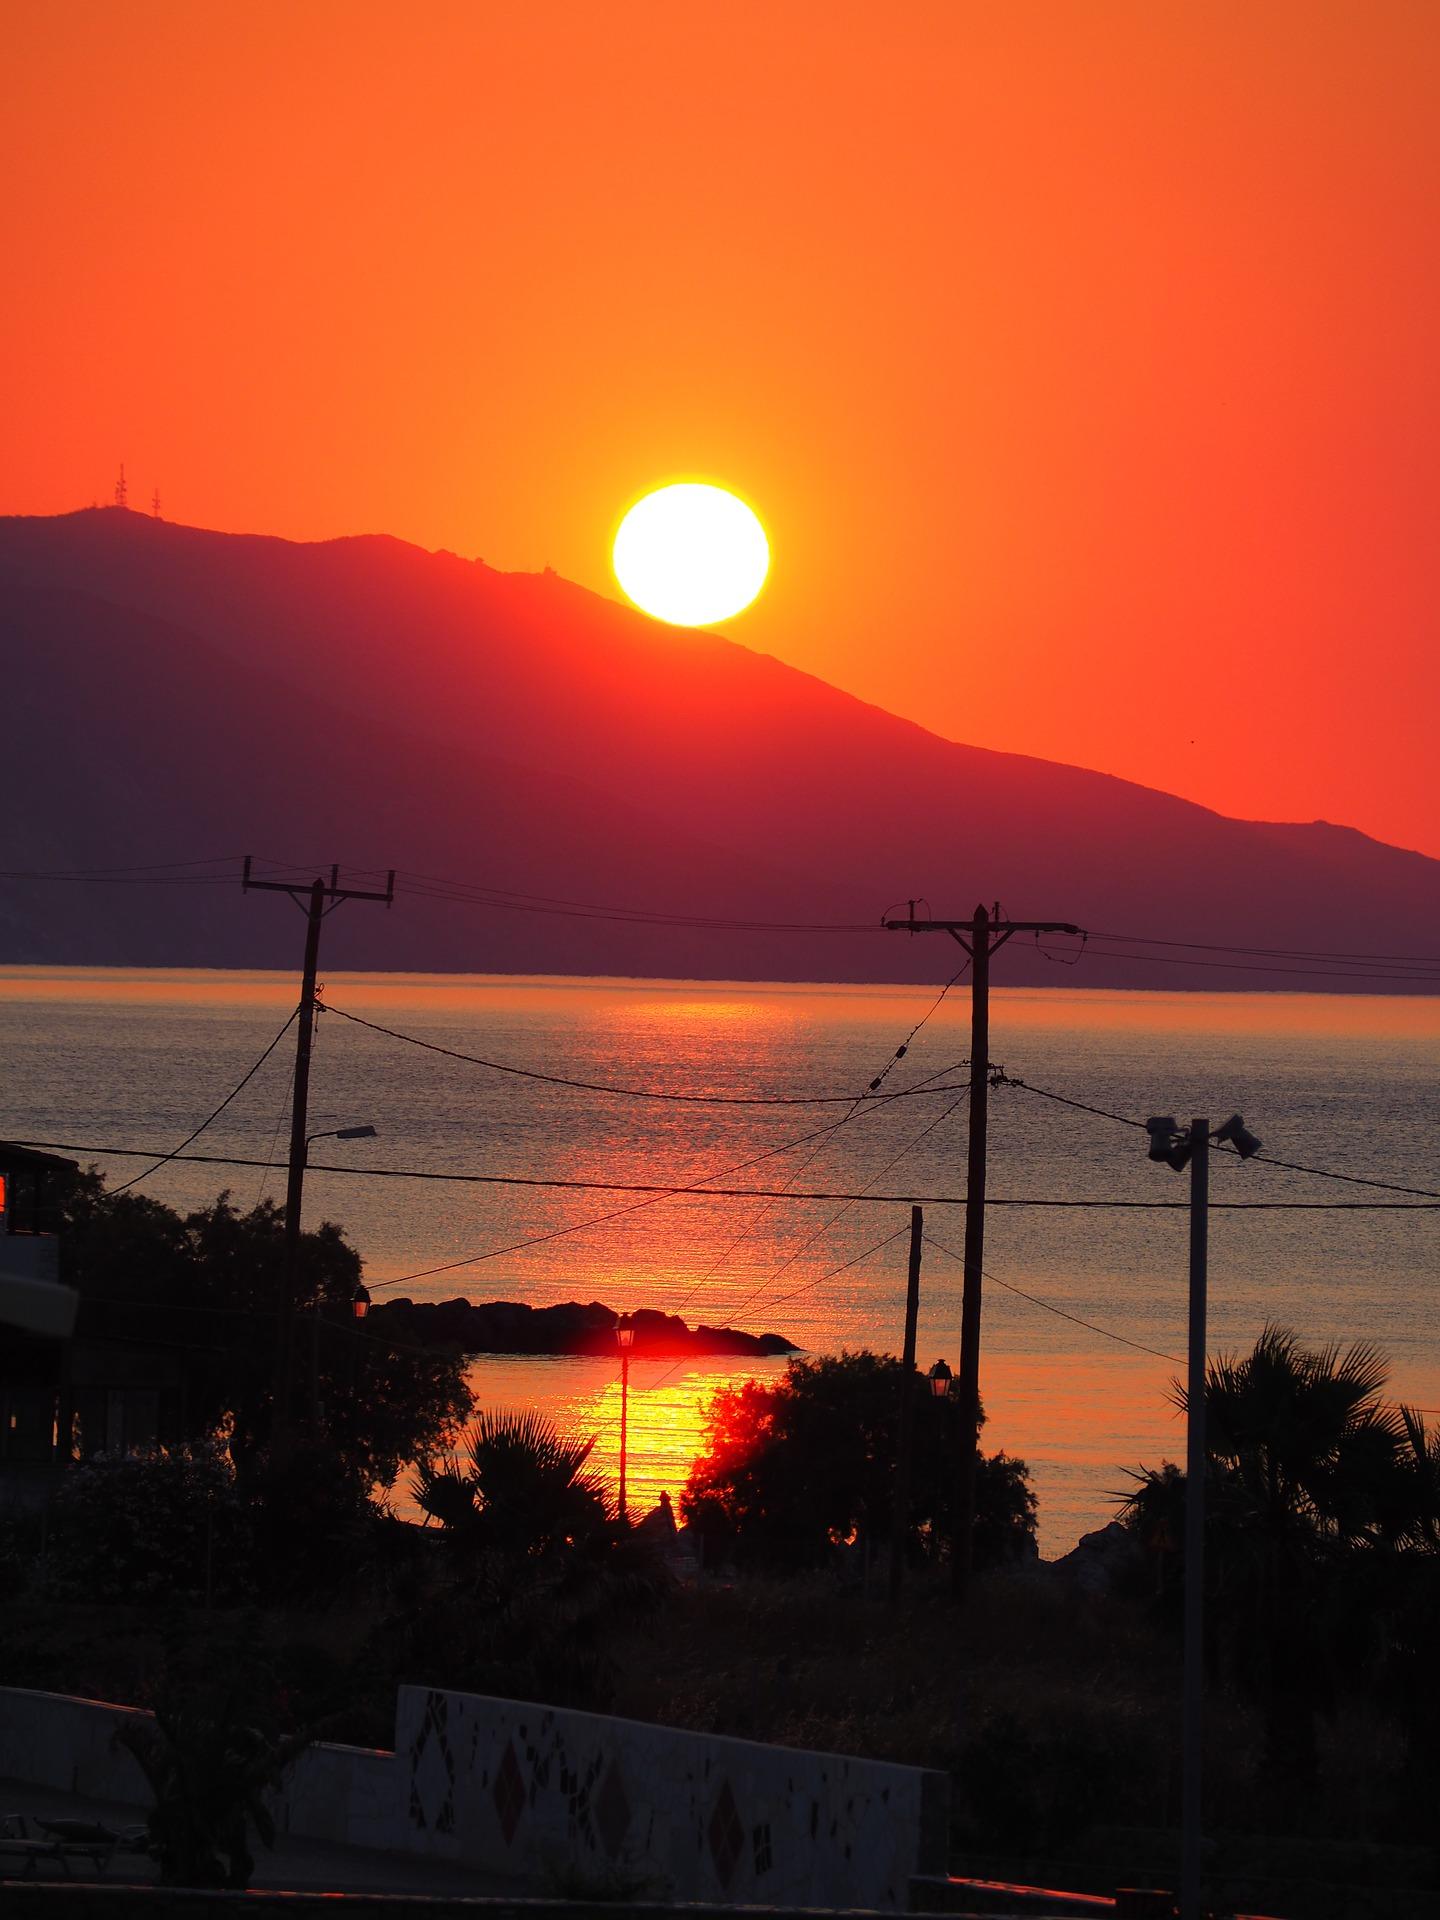 sunset-2452537_1920